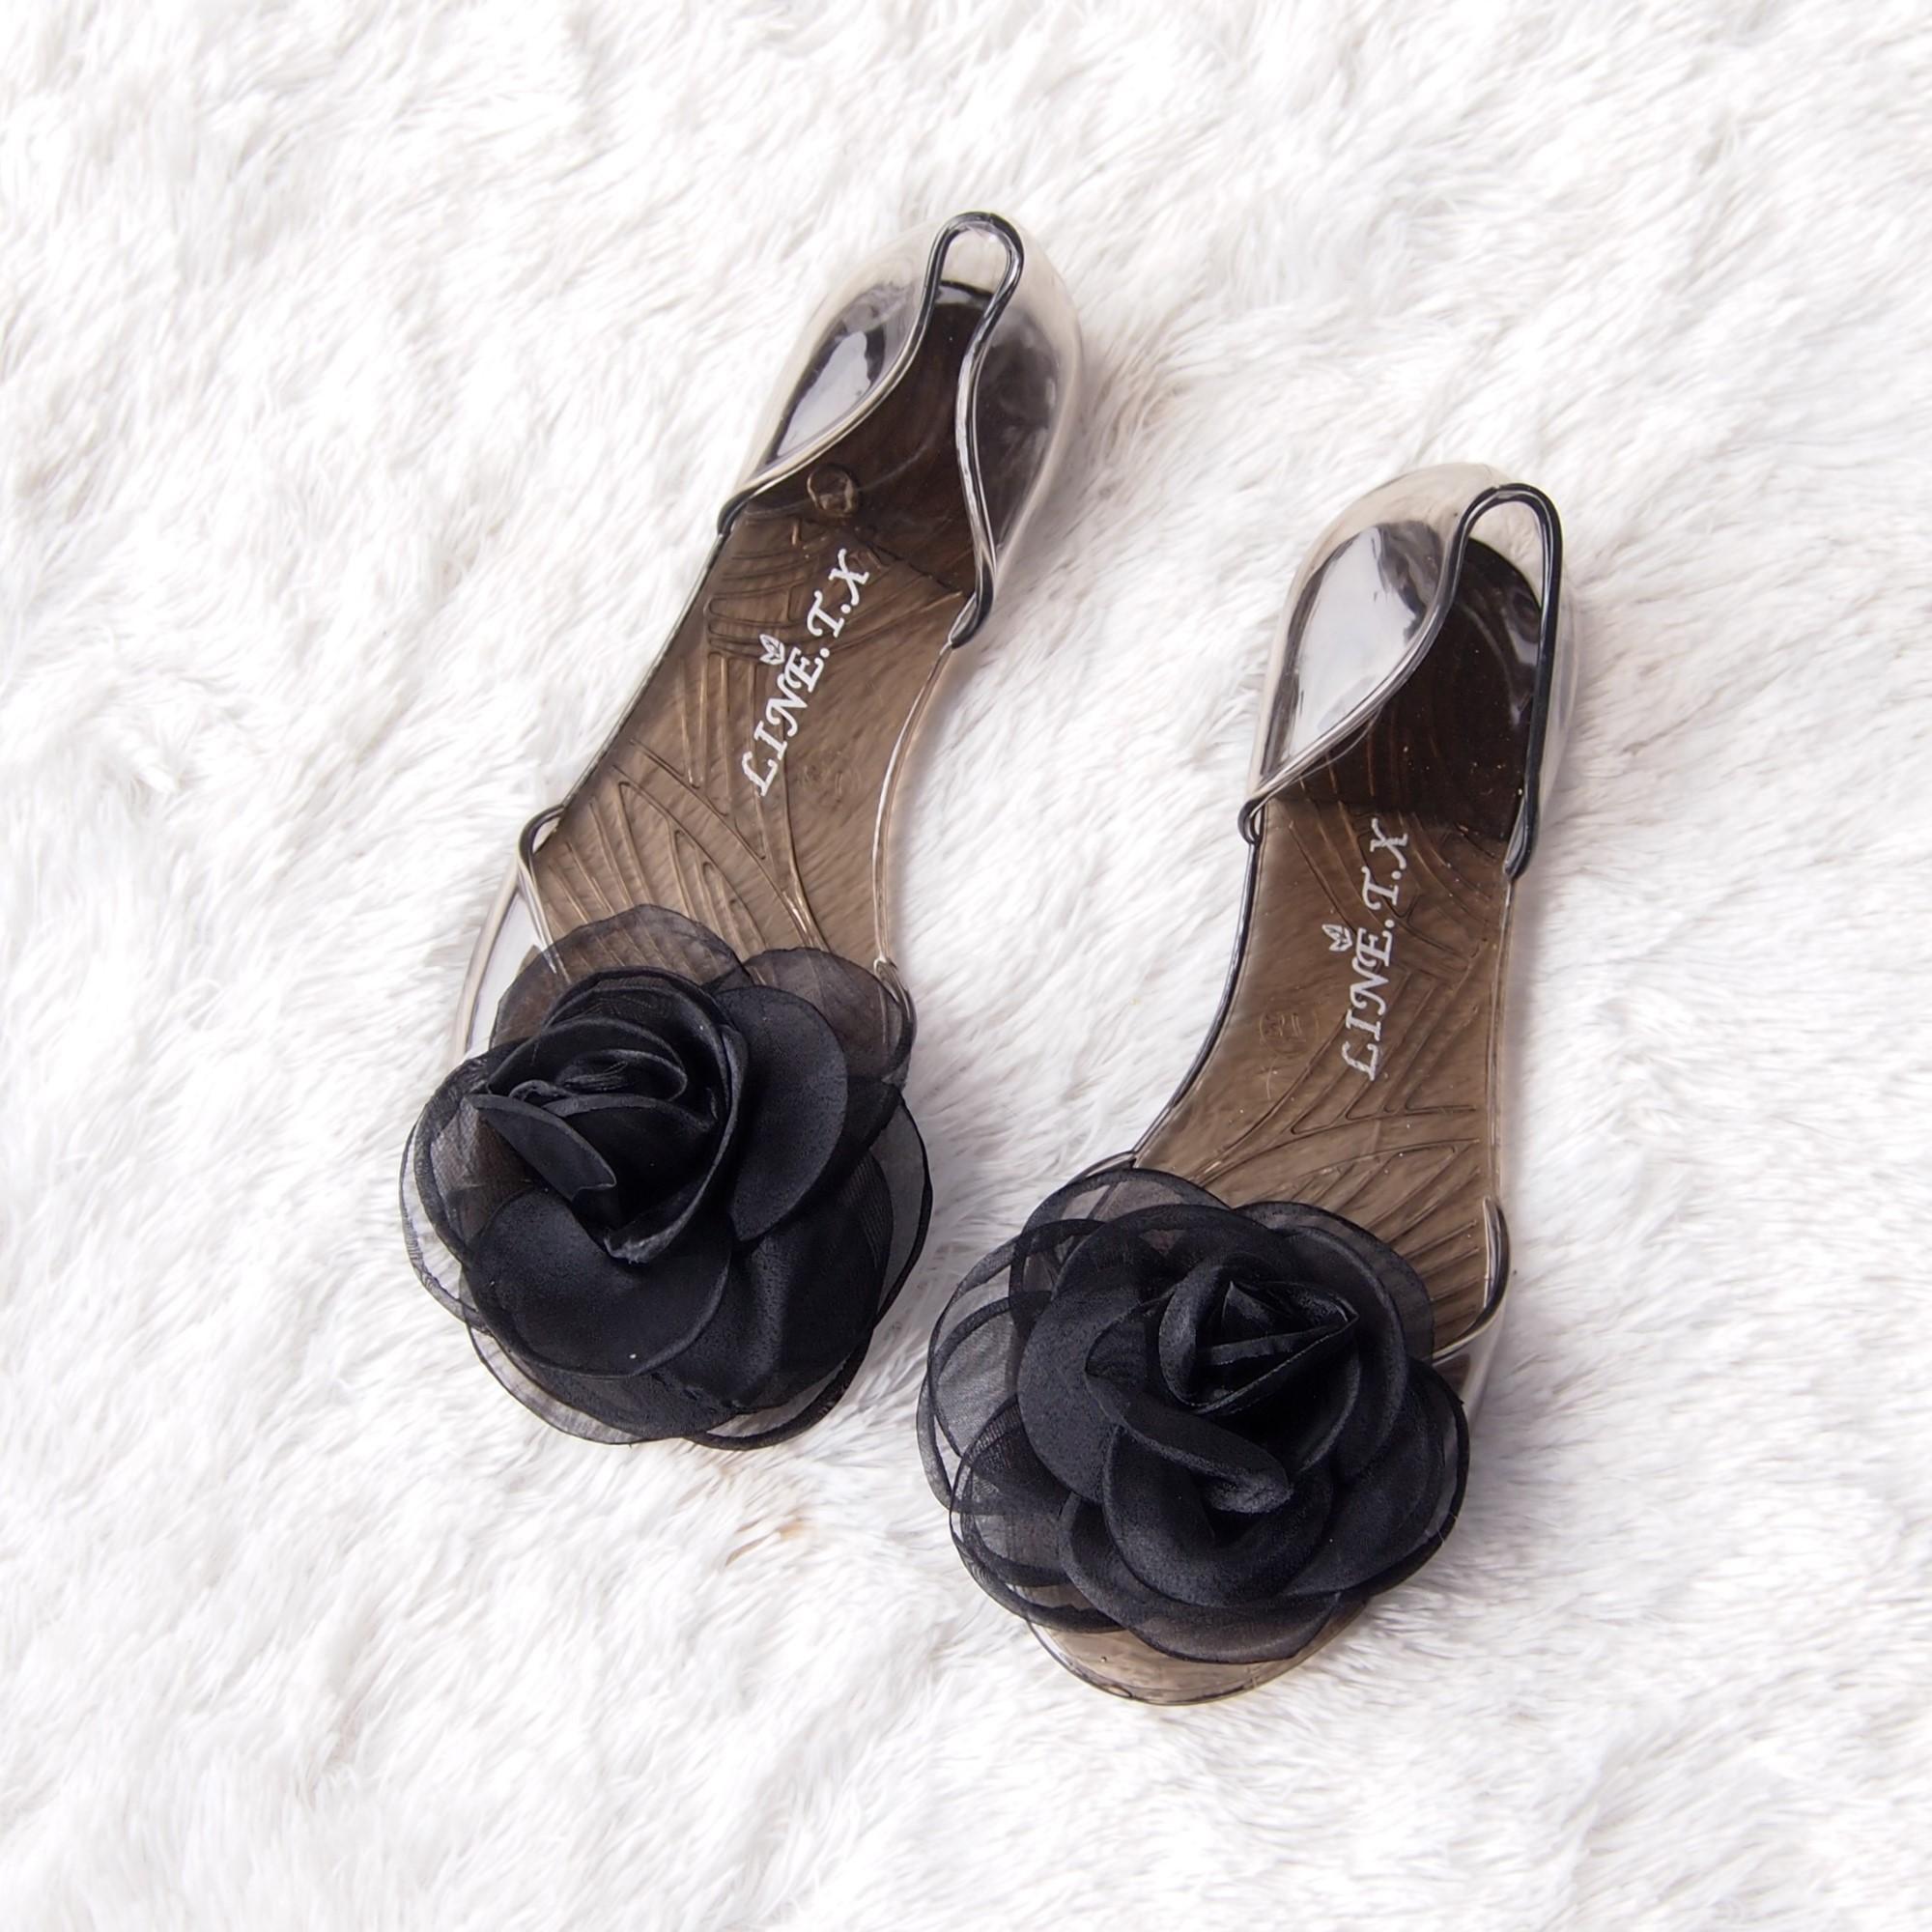 Transparan Besar Bunga Sandal Sepatu Jelly Mawar Merah Muda Daftar Lusty Bunny Bunyi Renda 2 Fuschia21 Ballet Rose 1681 Warna Random